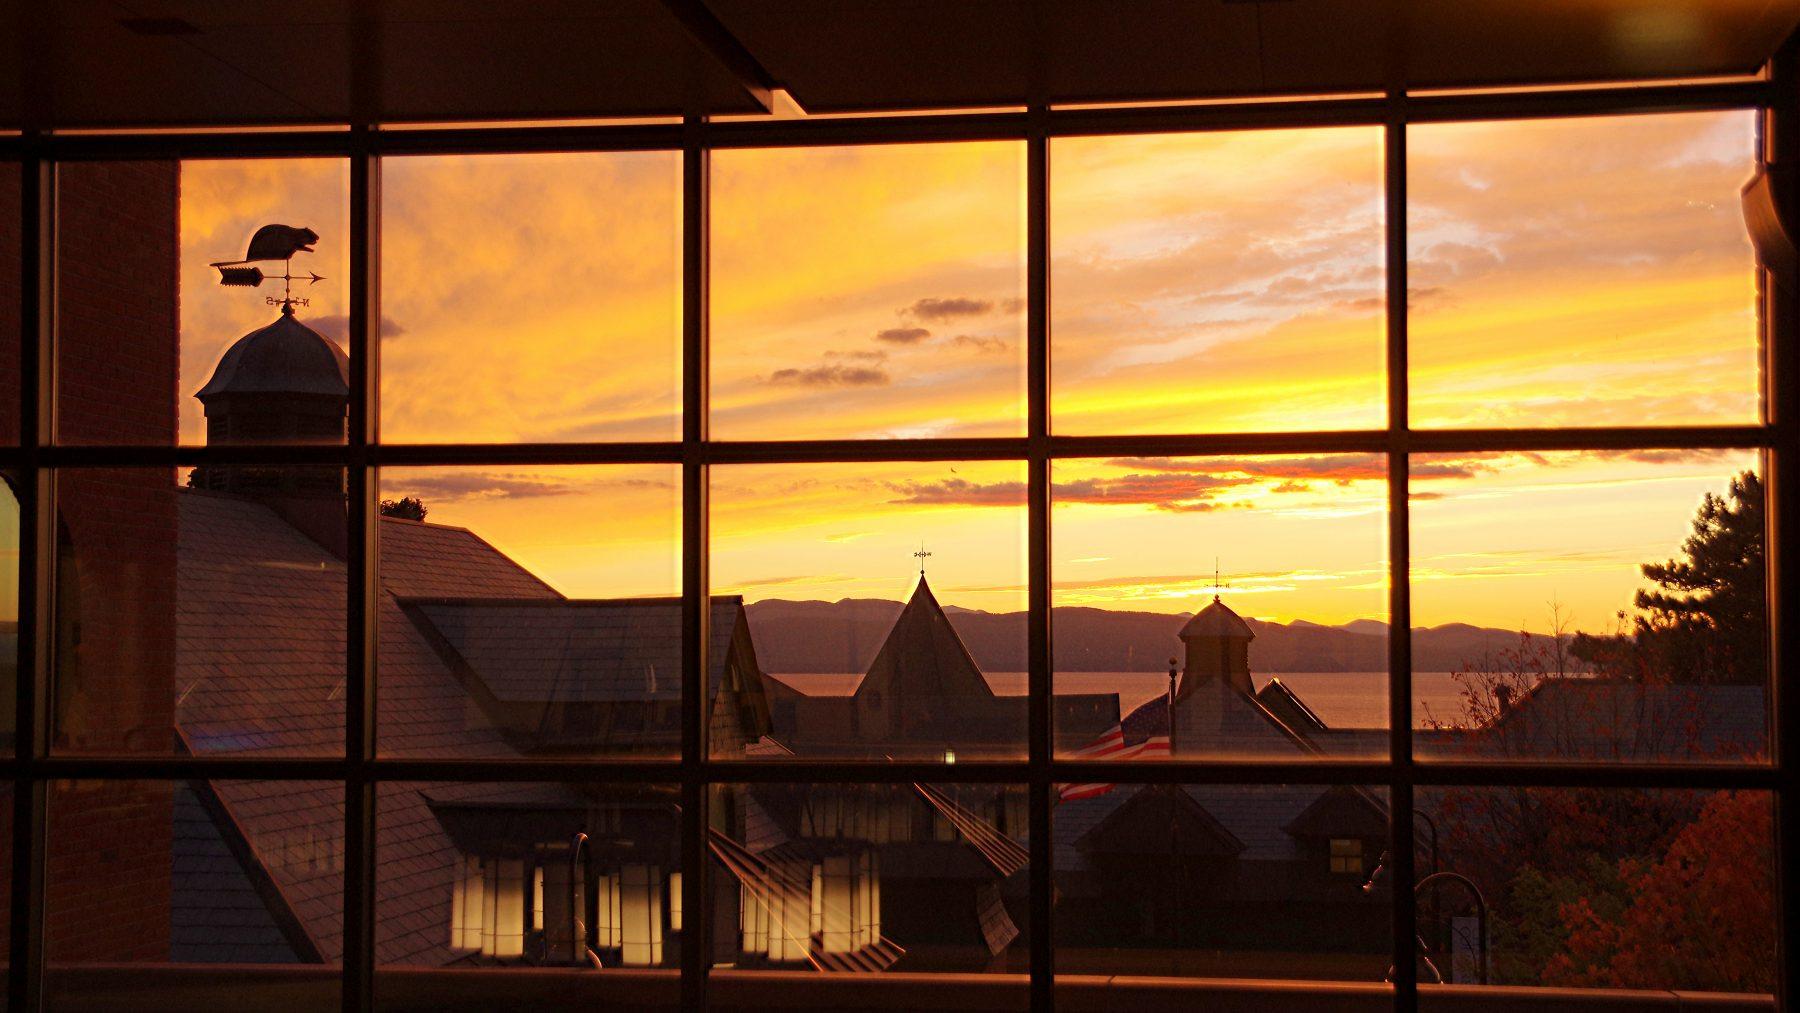 Sunset over Lake Champlain through a windowpane